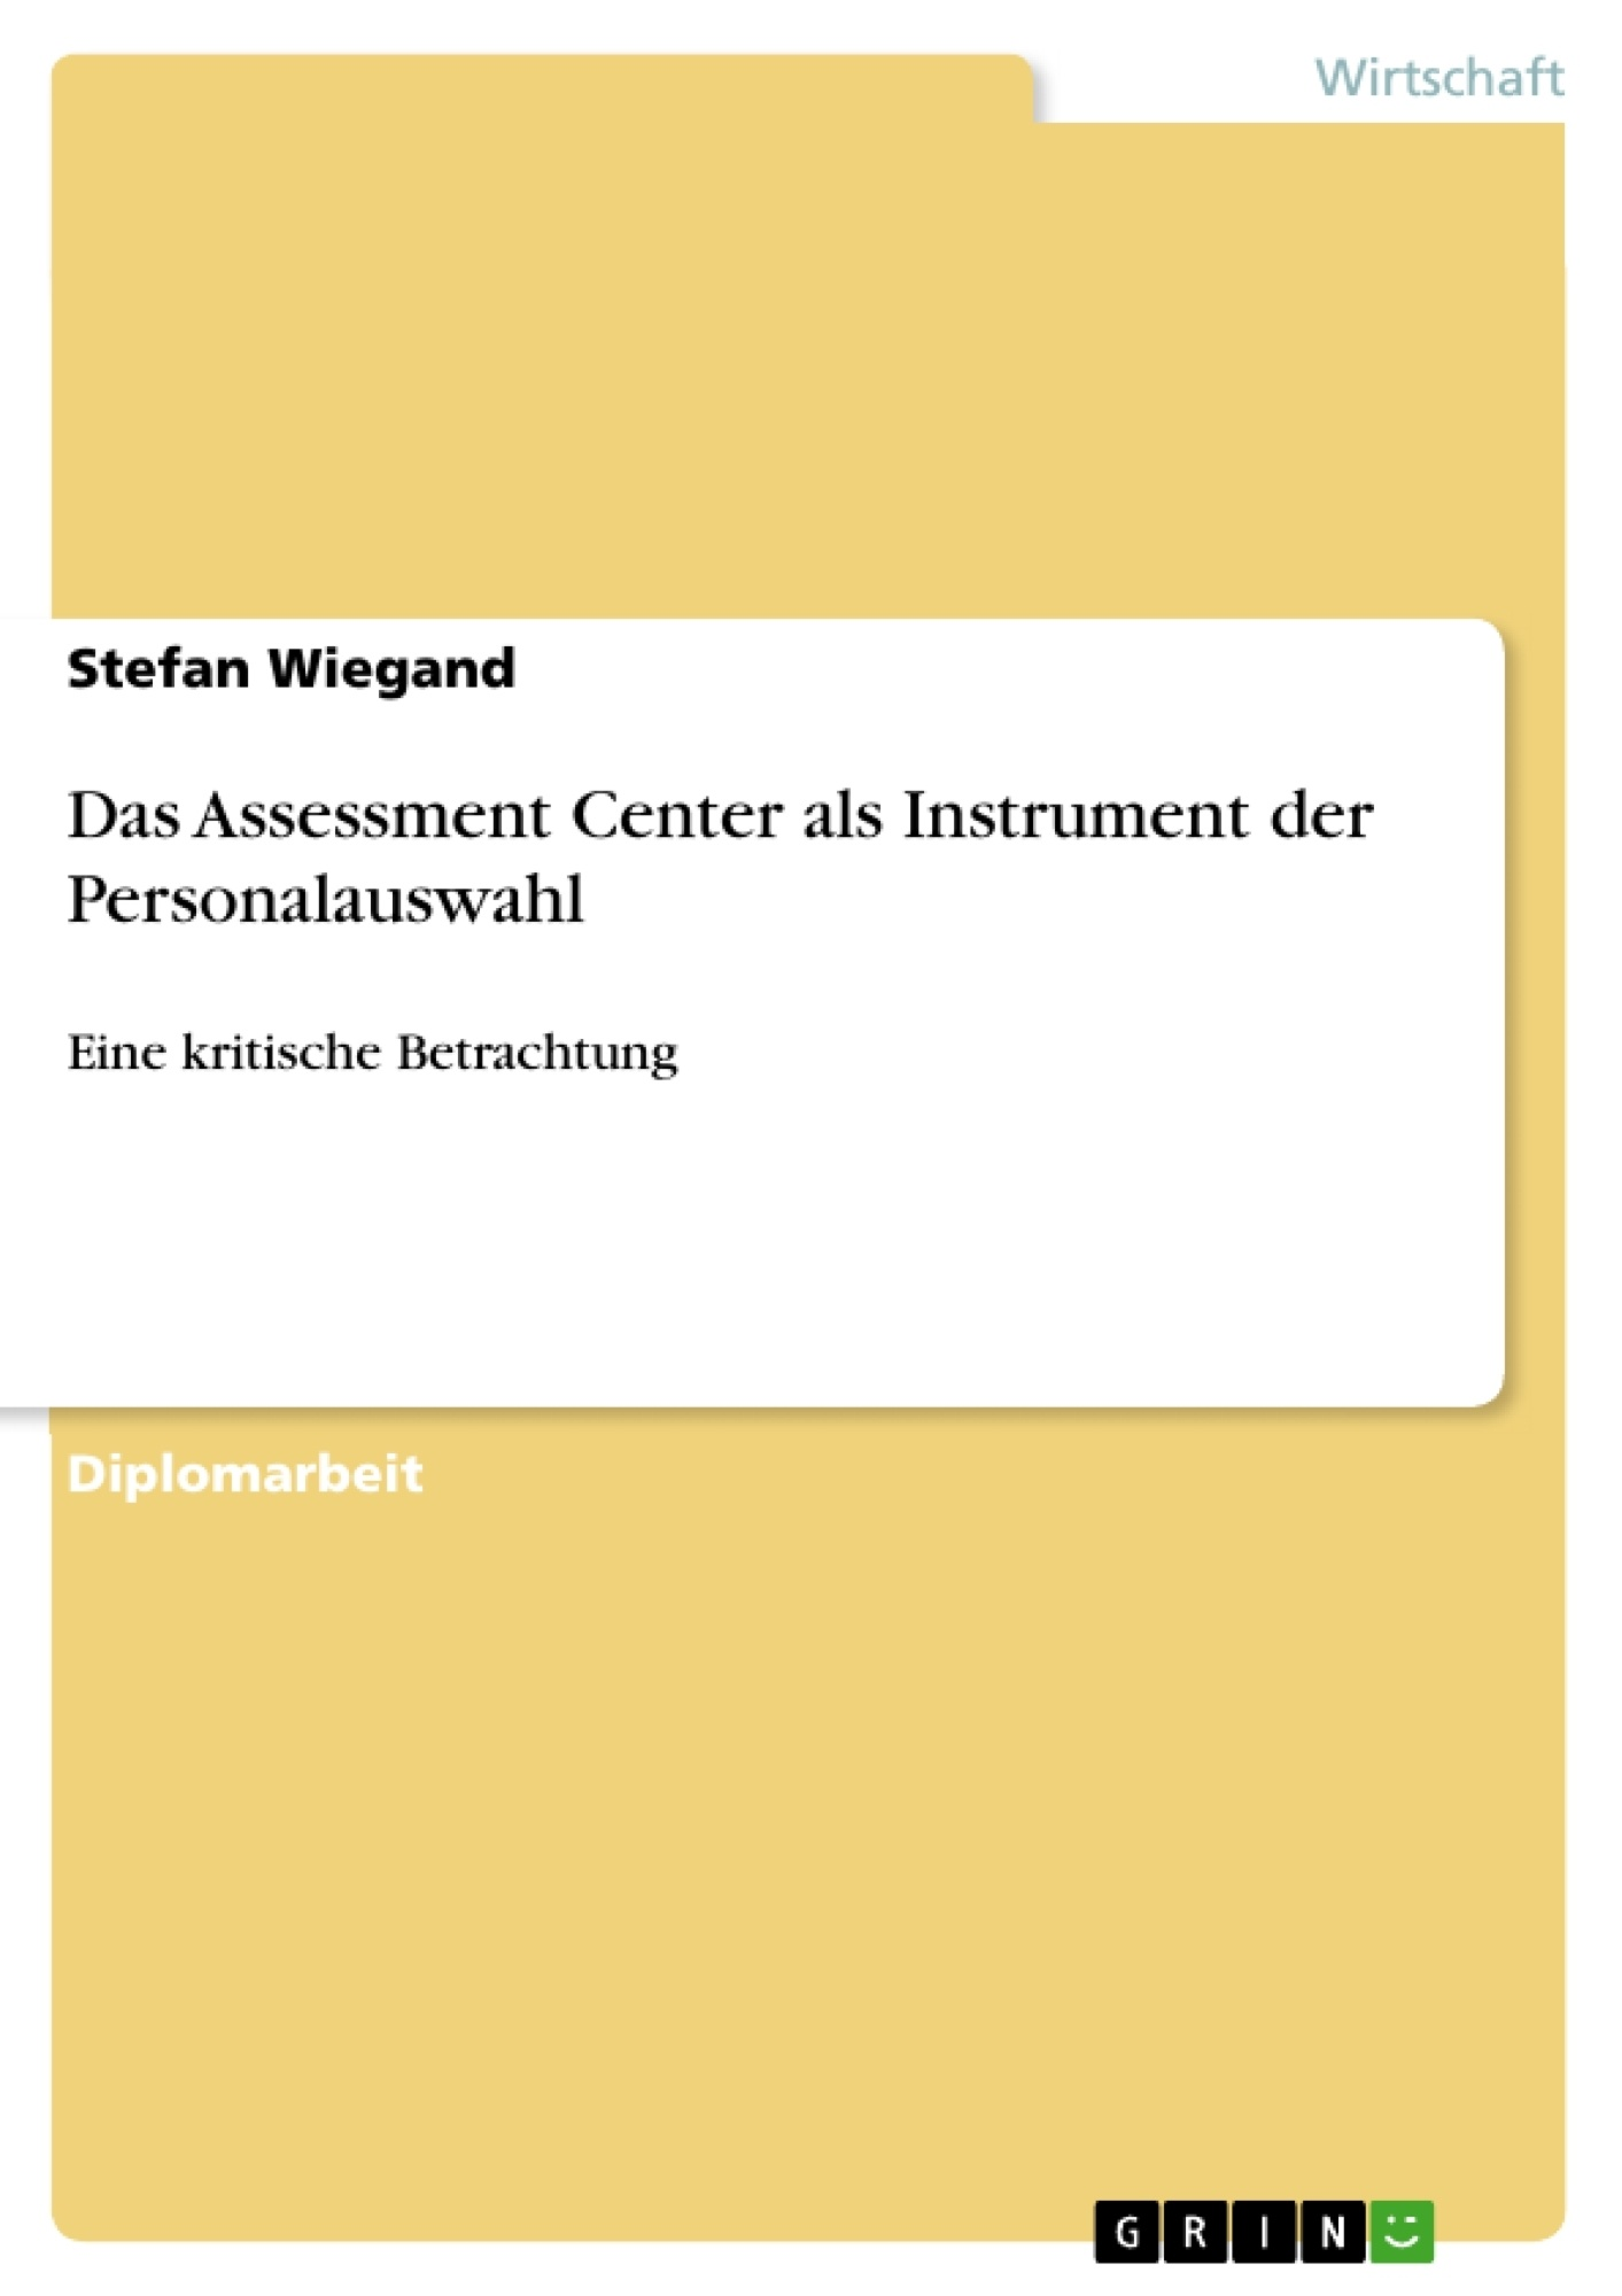 Titel: Das Assessment Center als Instrument der Personalauswahl